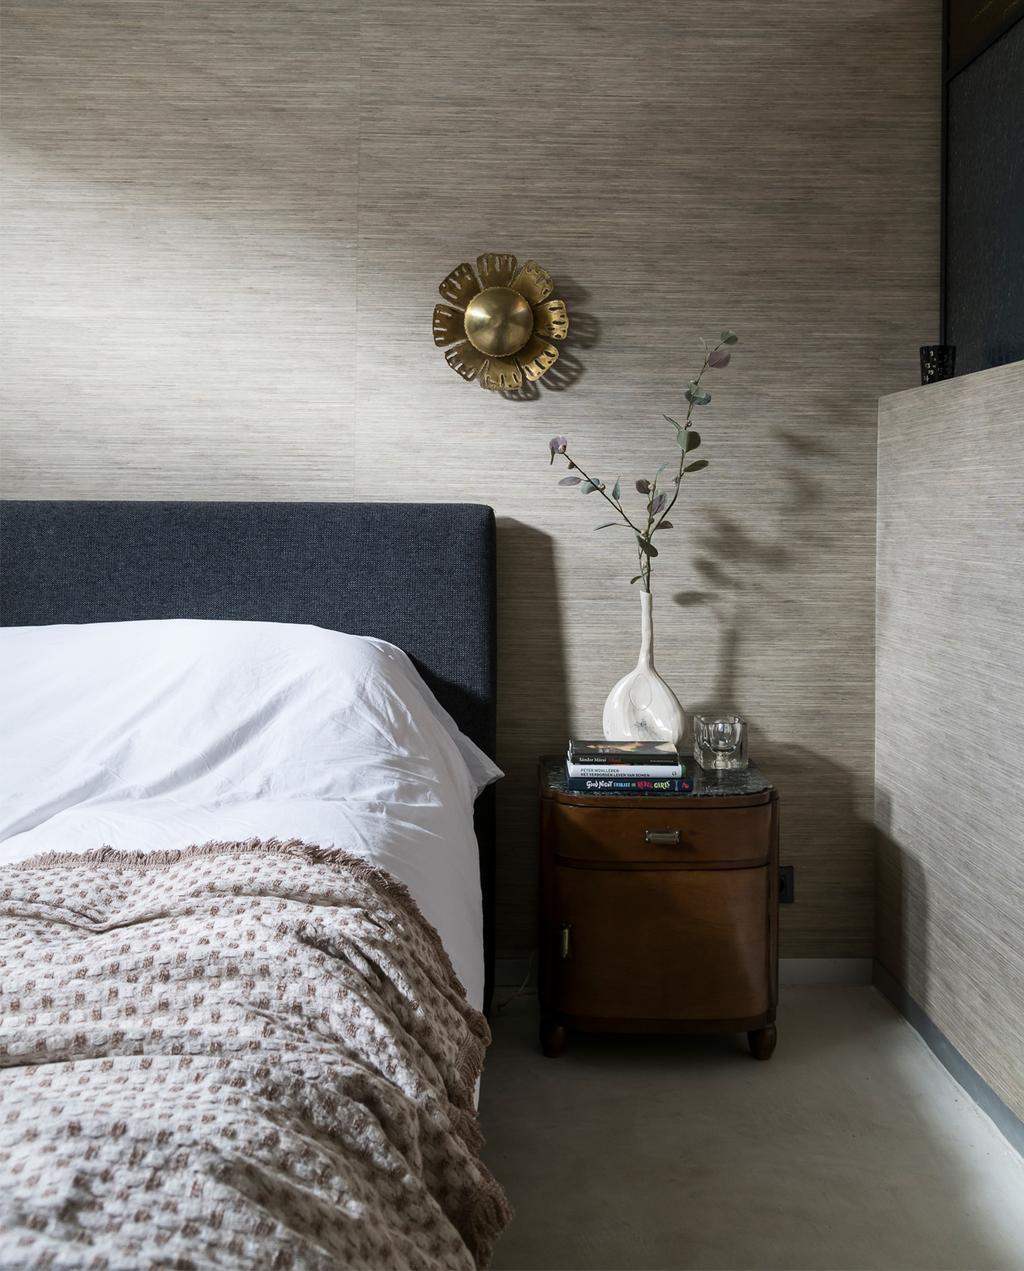 Appartement vol vintage design in Antwerpen